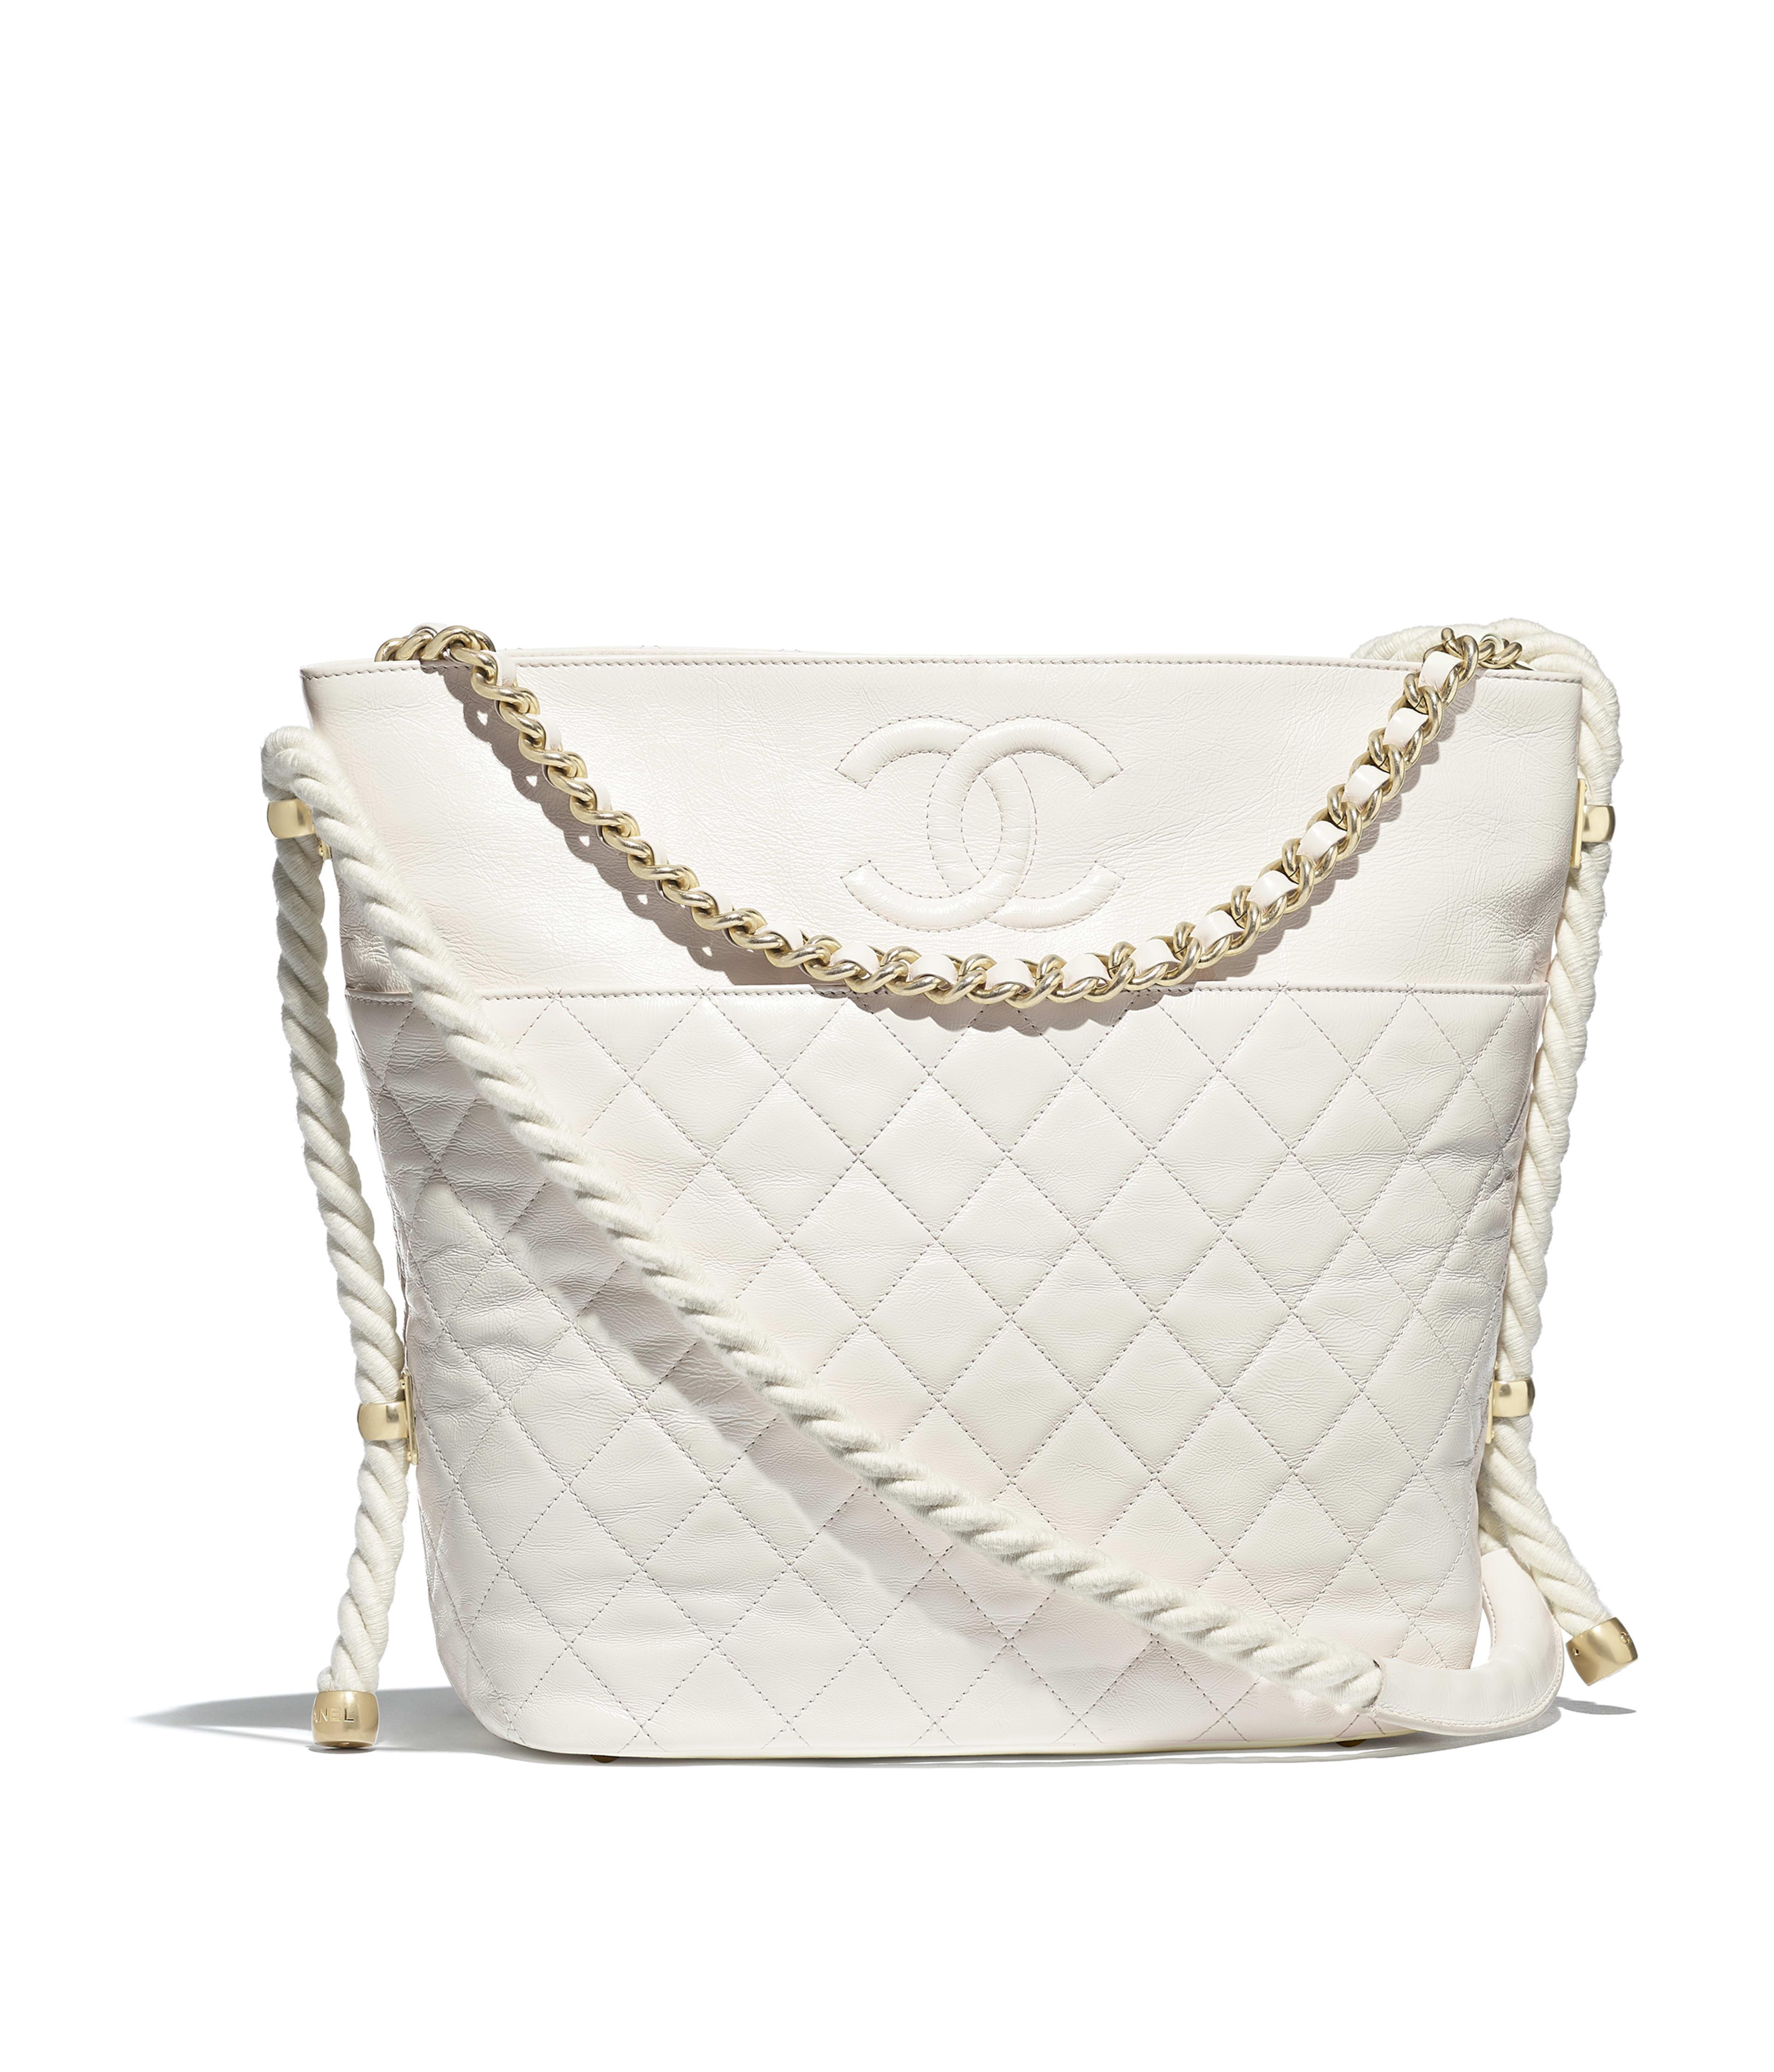 Hobo Handbag Crumpled Calfskin Cotton Gold Tone Metal White Ref As0076y8410010601